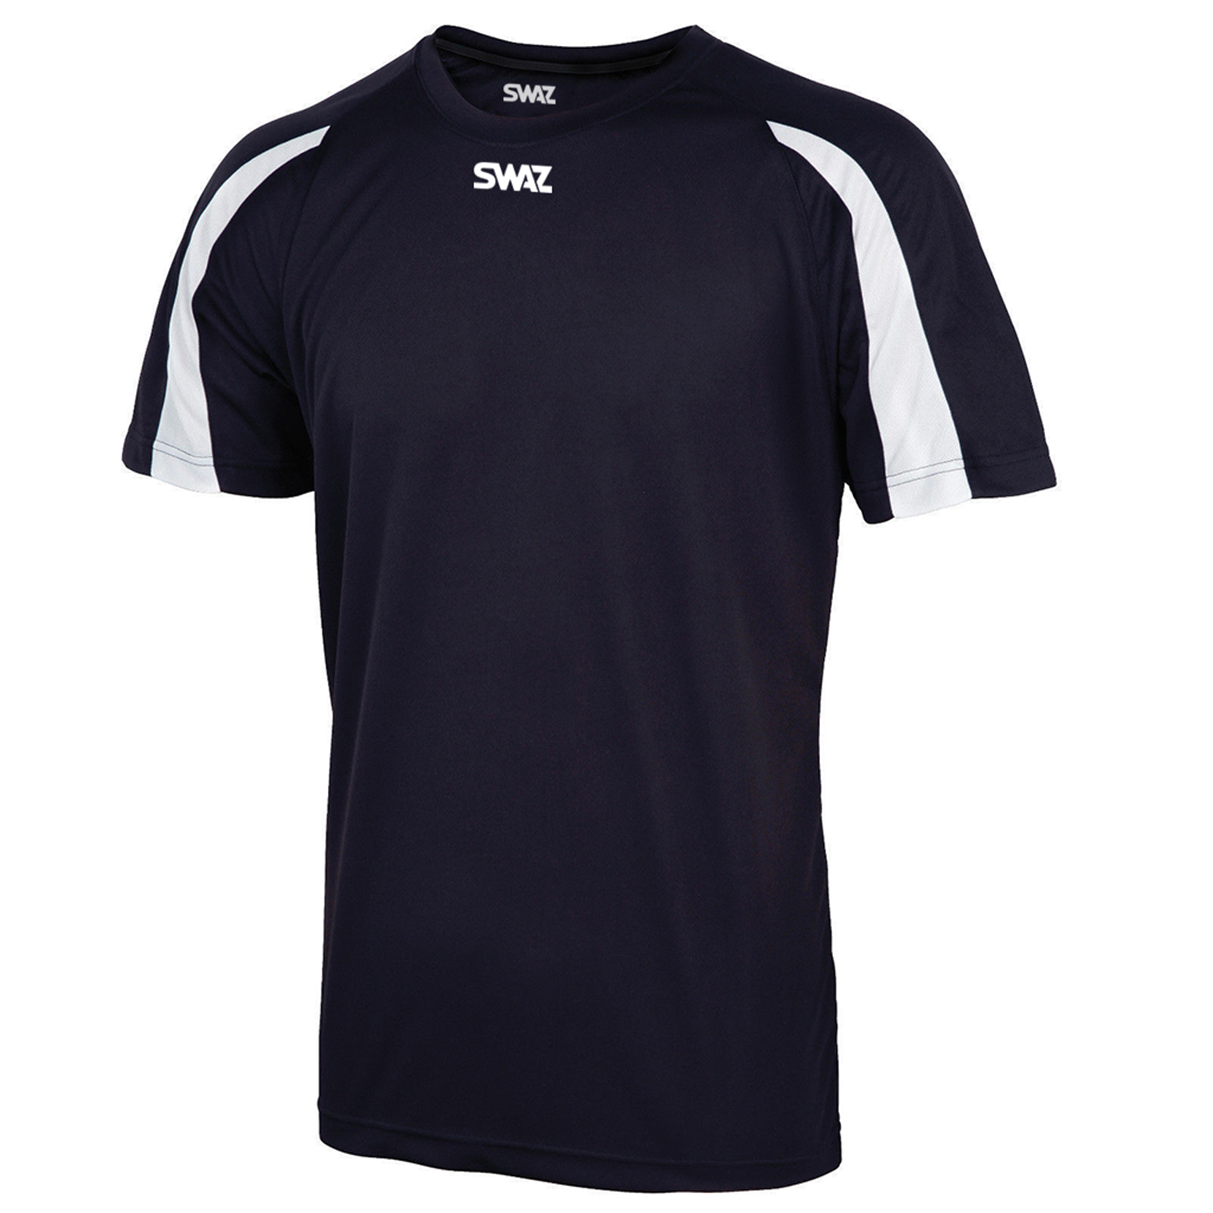 SWAZ Premier Training T-Shirt – Navy/White